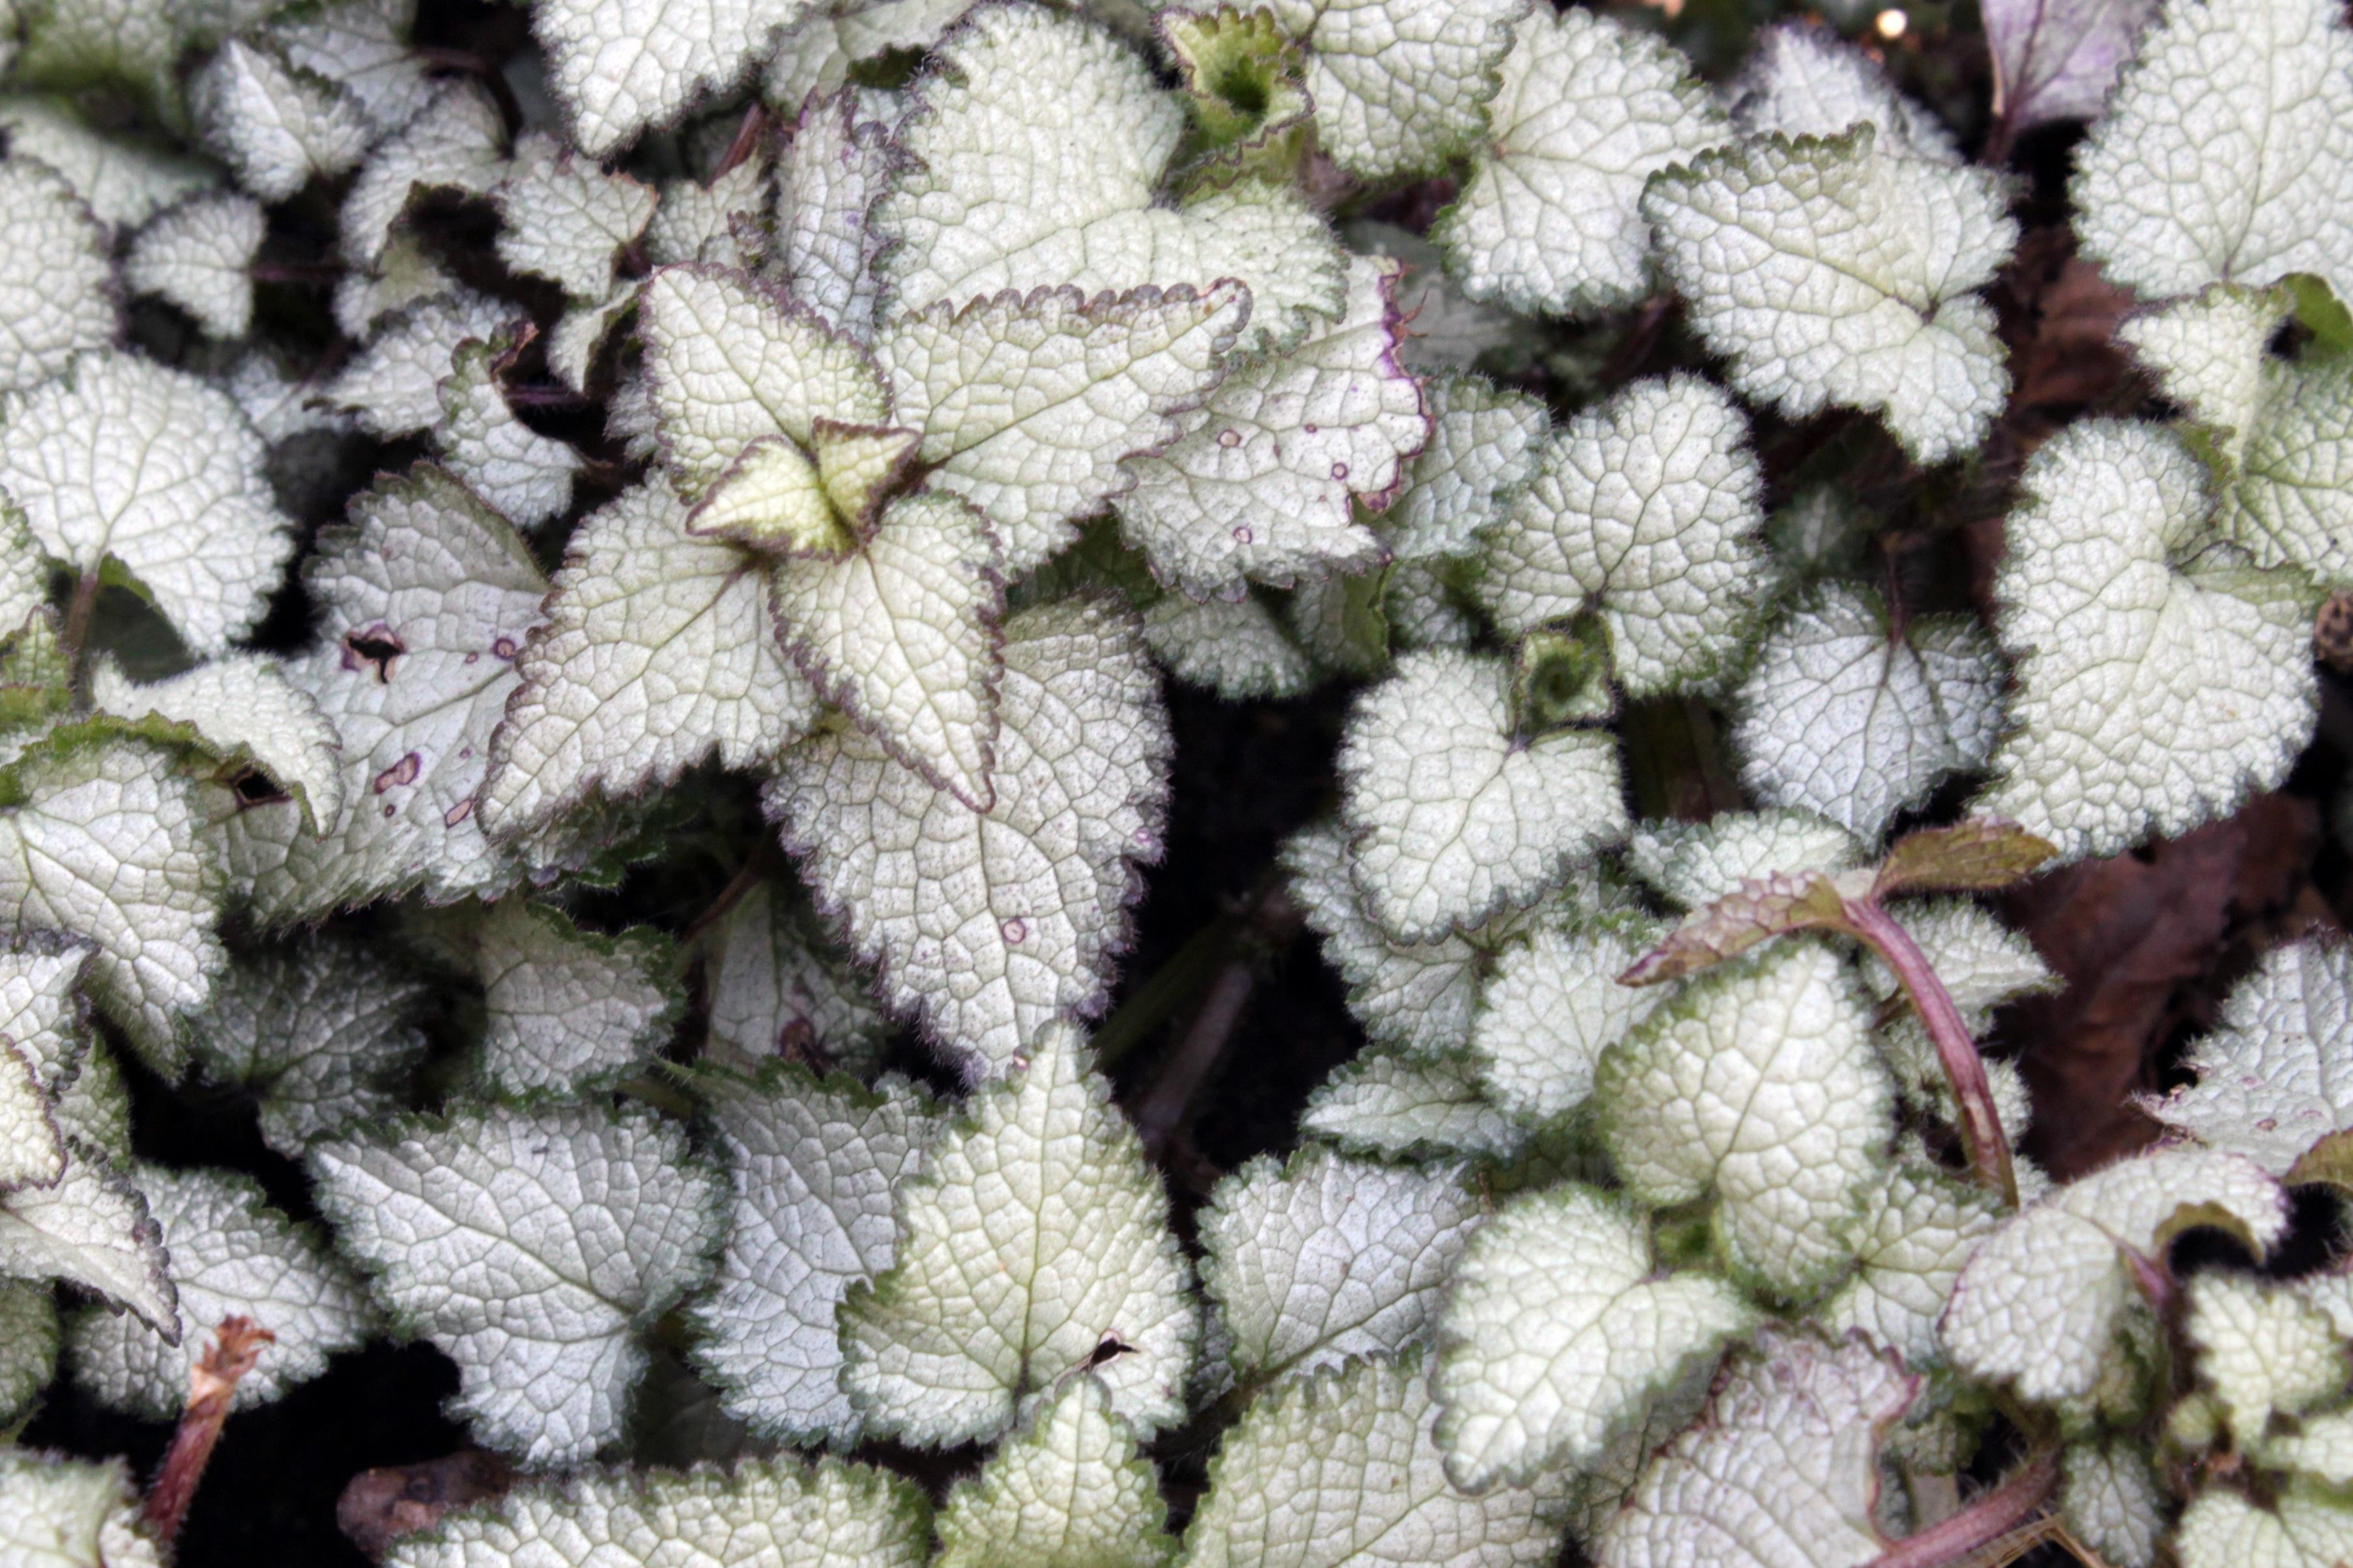 Kostenlose foto : Natur, Weiß, Textur, Blatt, Blume, lila, Frost ...